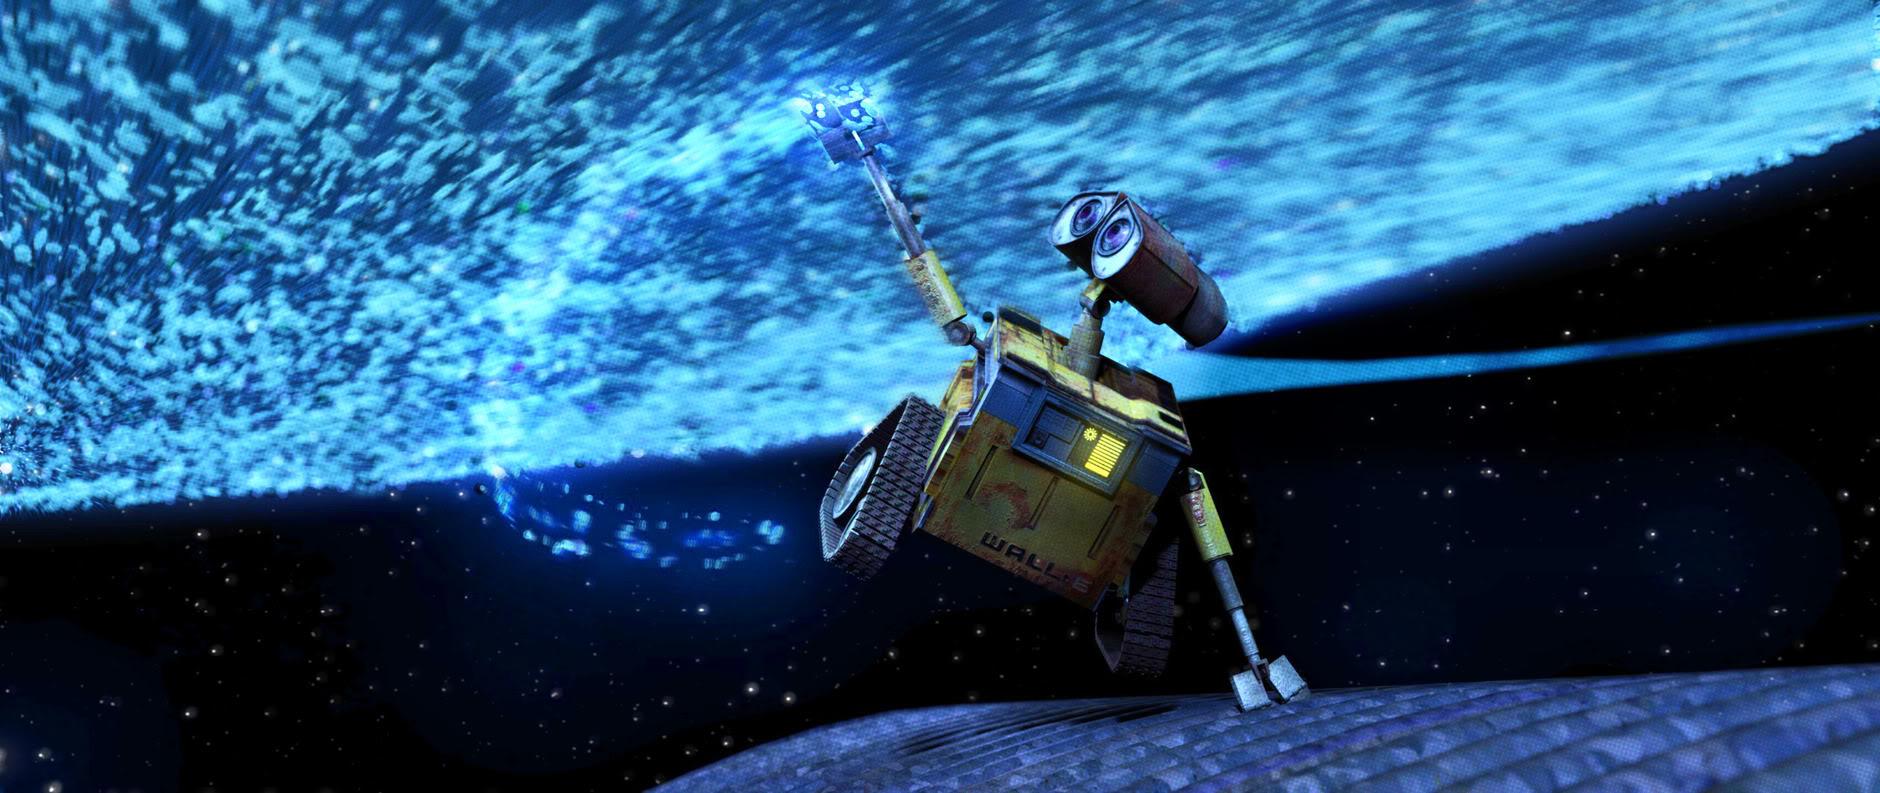 Wall-E-Stars-Flying